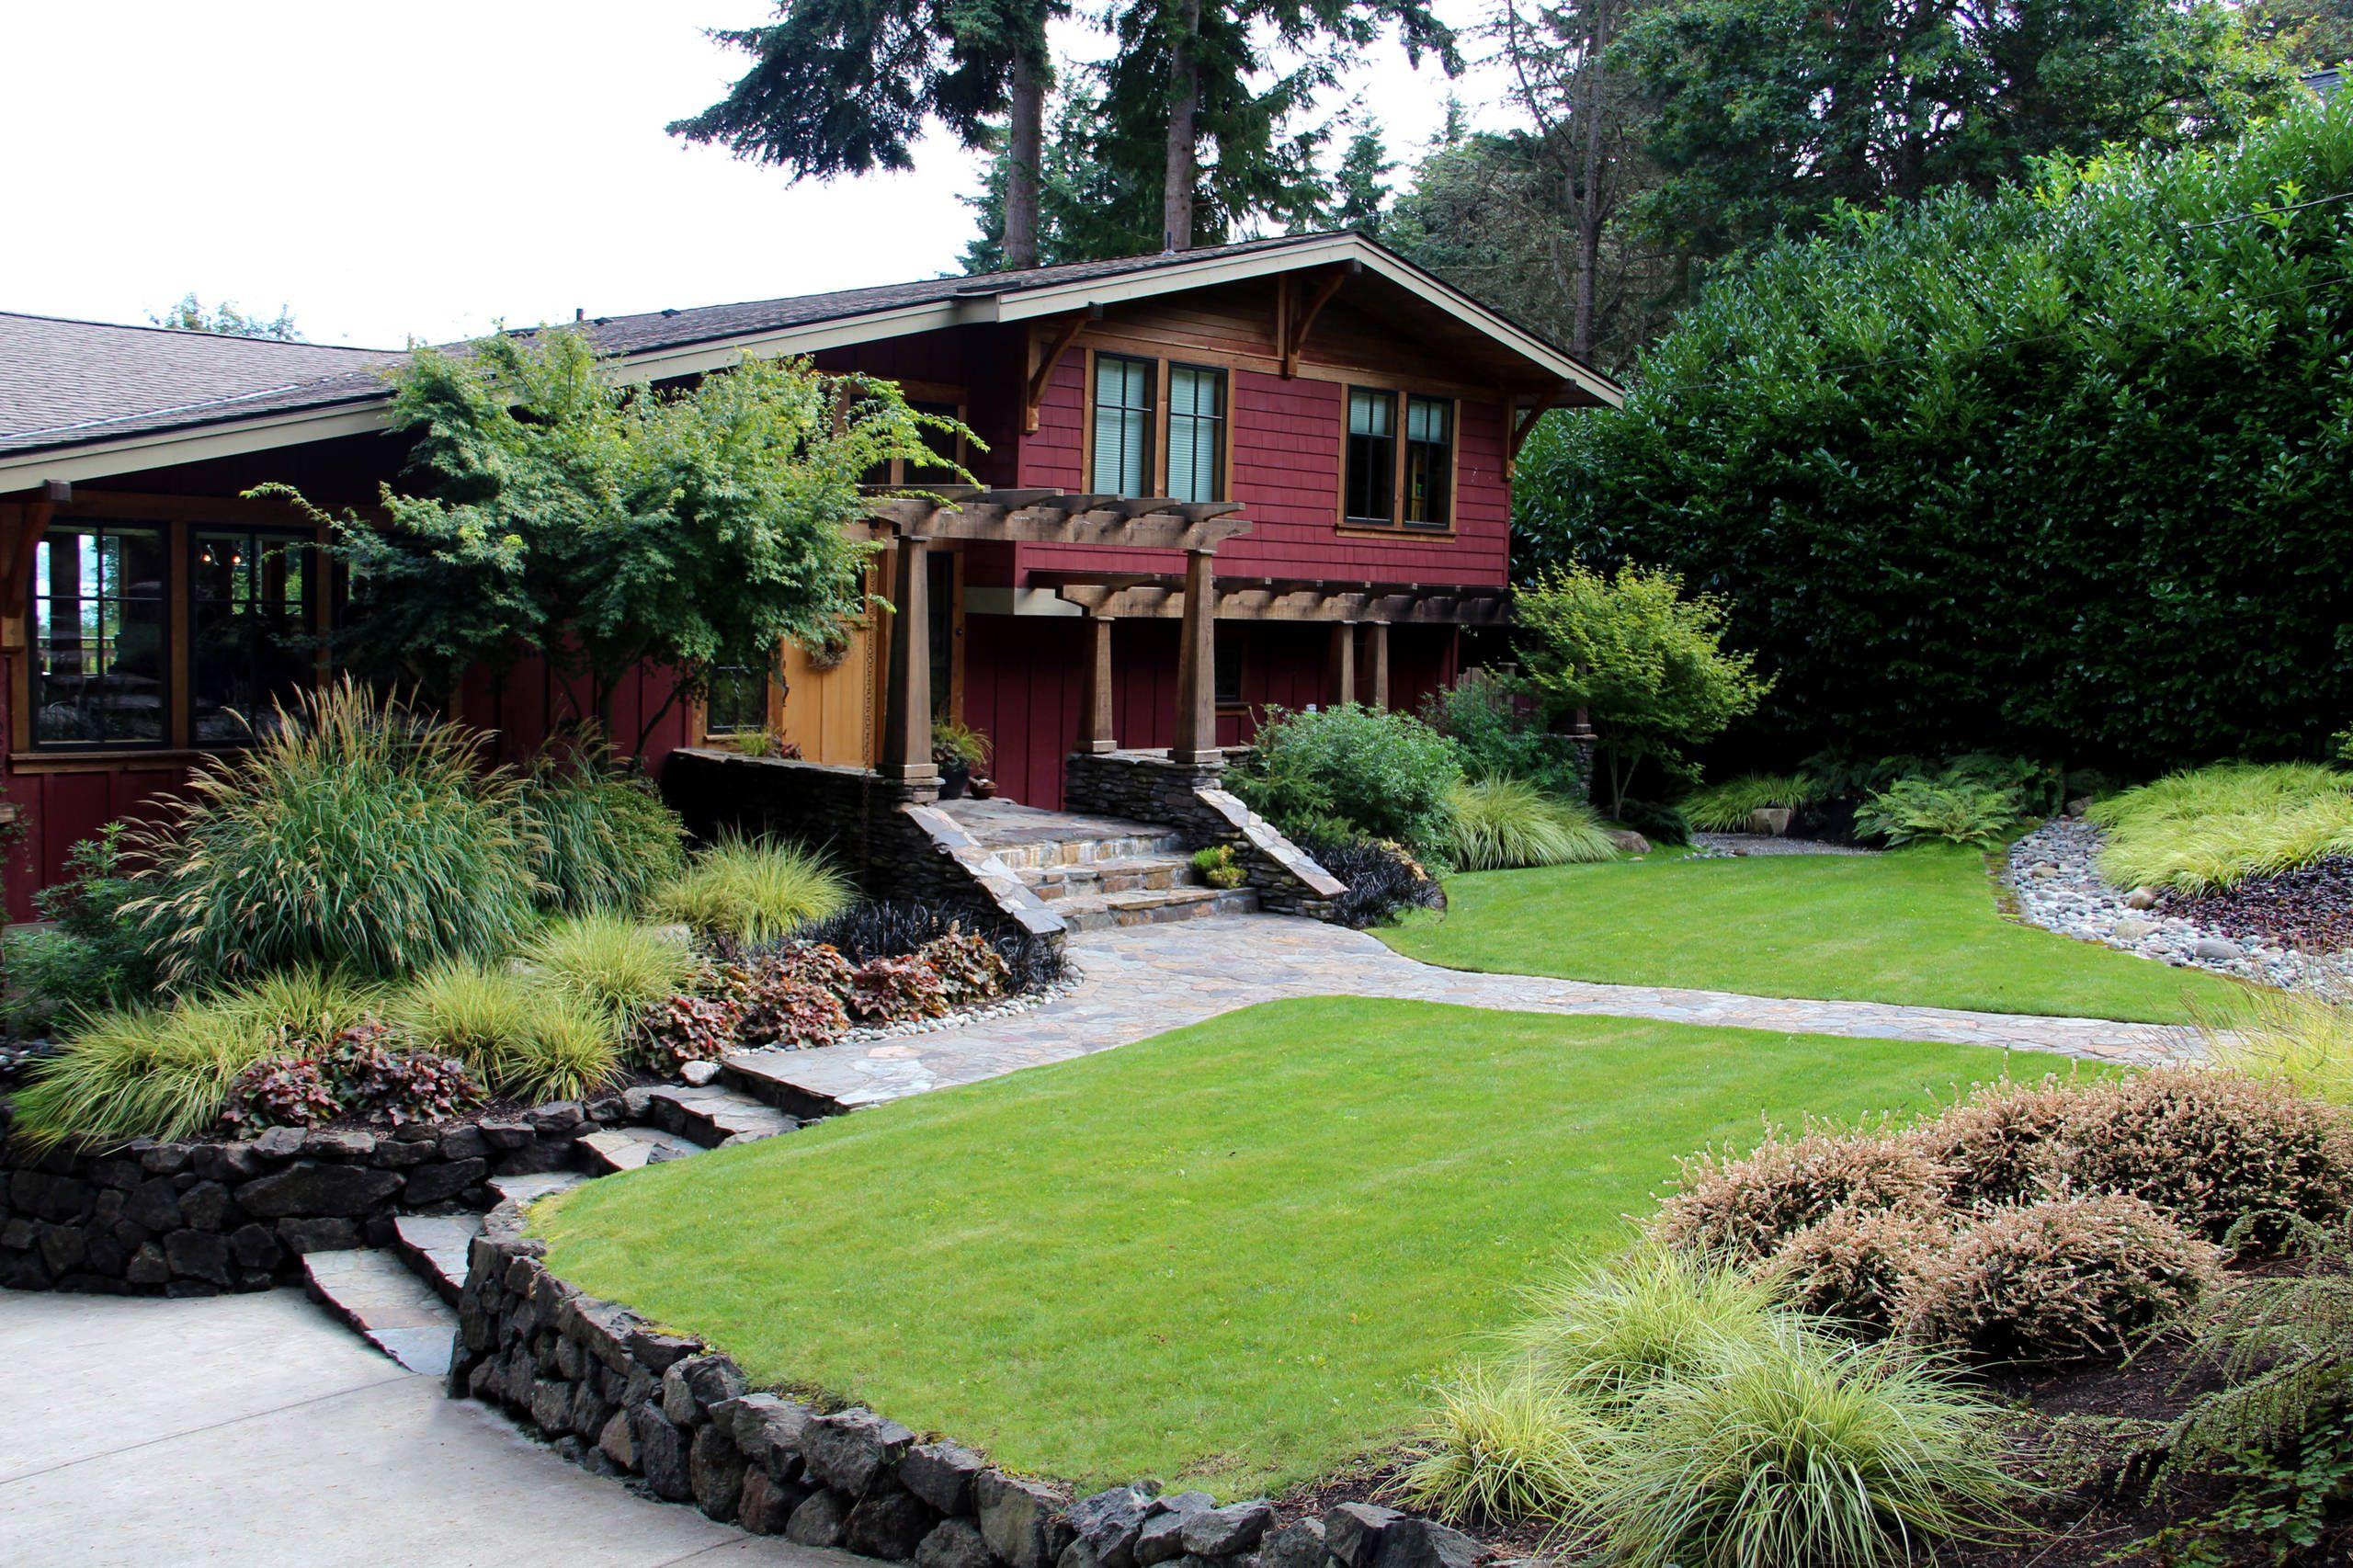 10 Awesome Landscaping Ideas For Split Level Homes 2020 on Split Garden Ideas id=95556